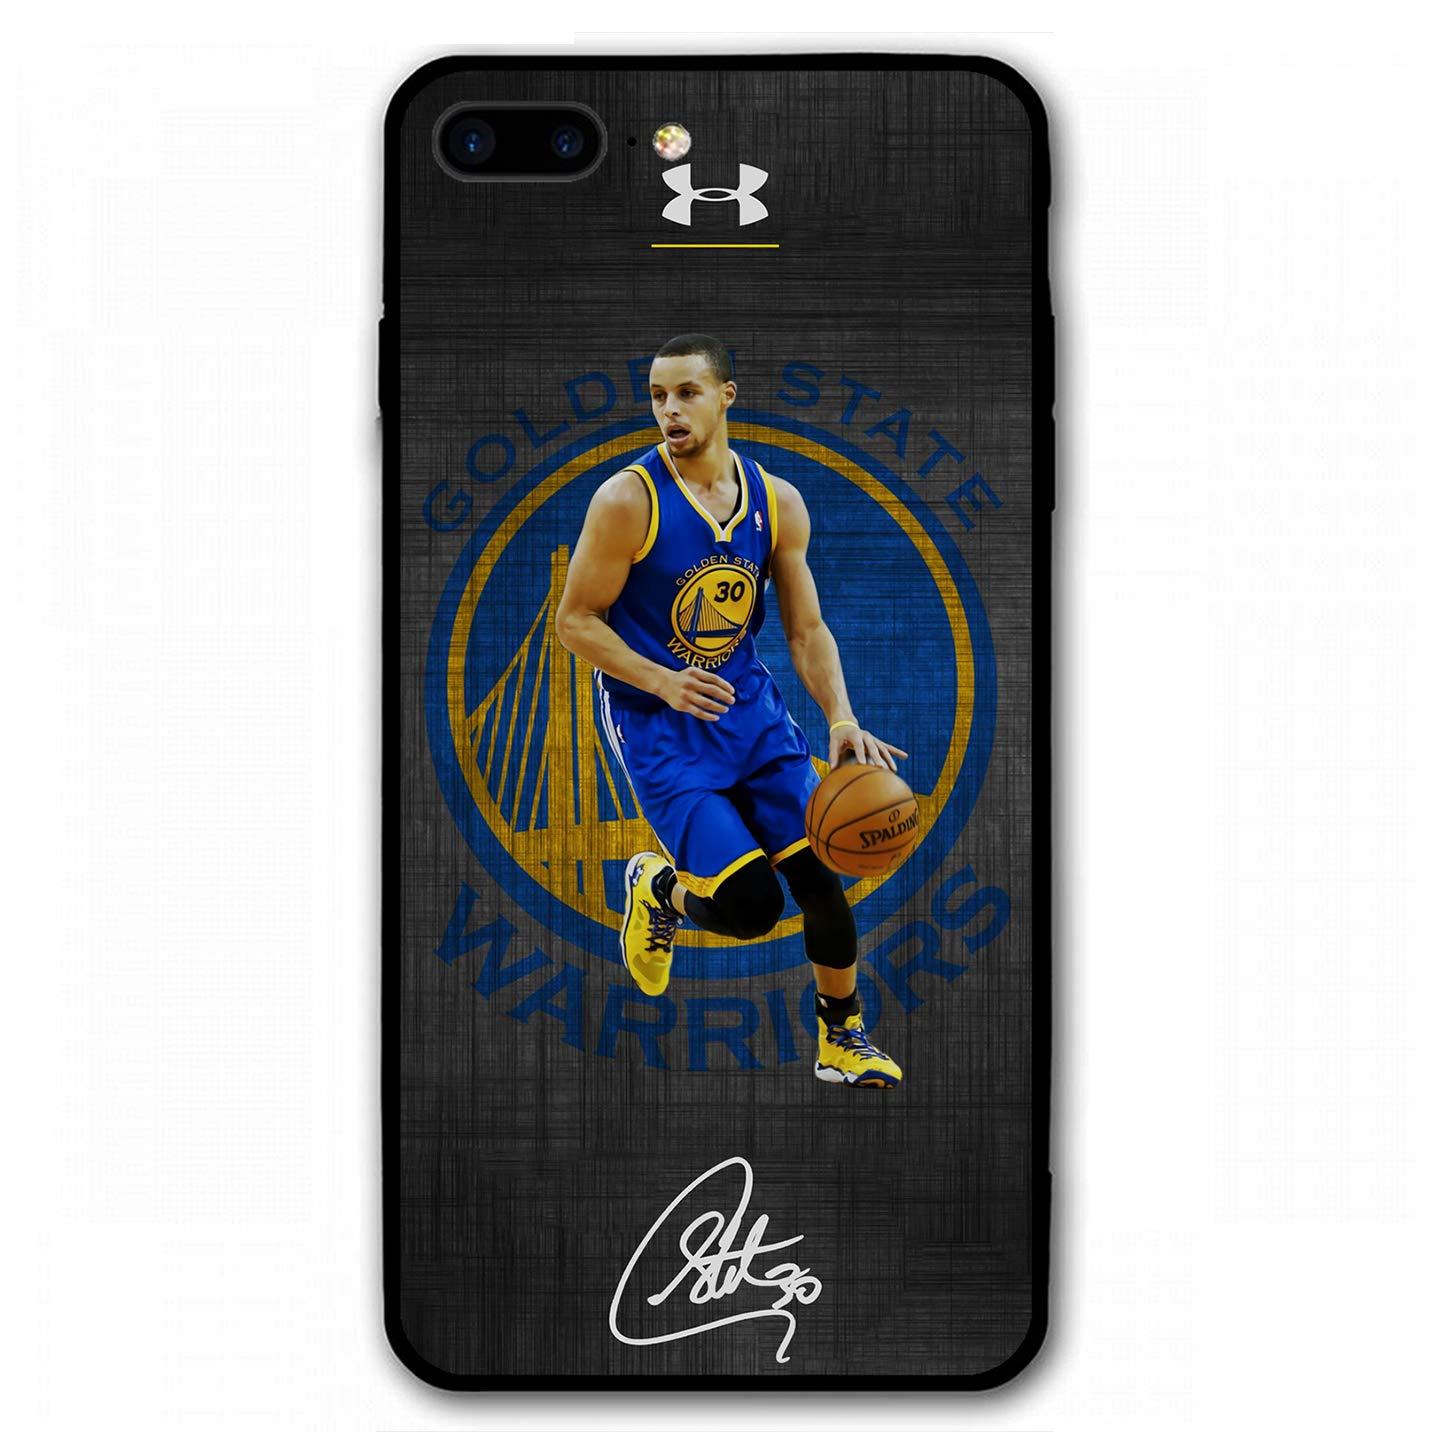 iPhone 7/8 Plus Case Golden State Curry Sign Custom Anti-Scratch Slim Cover Case Fashion Design (iPhone 7/8 Plus)